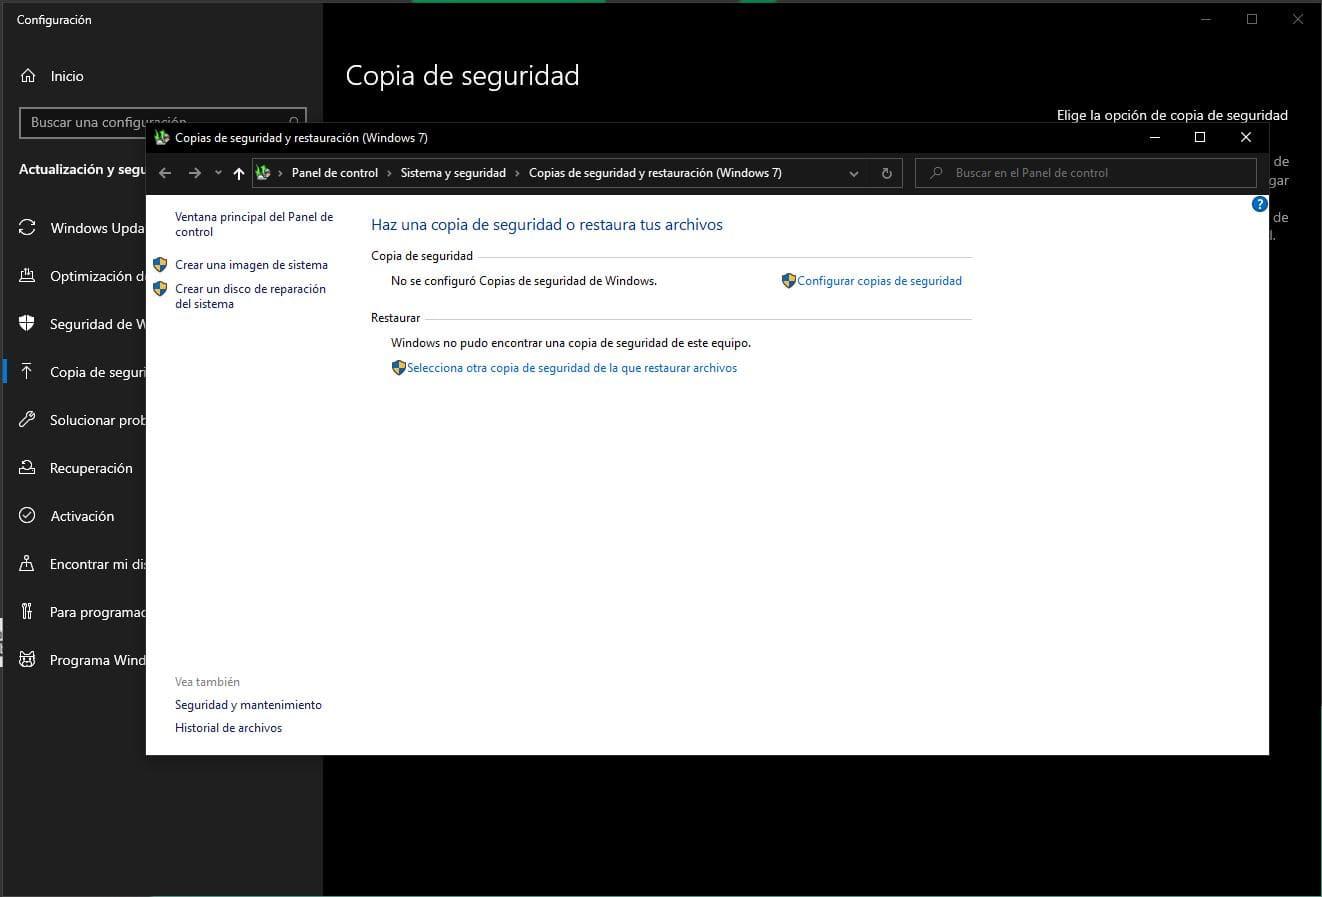 crear-imagen-sistema-windows-10